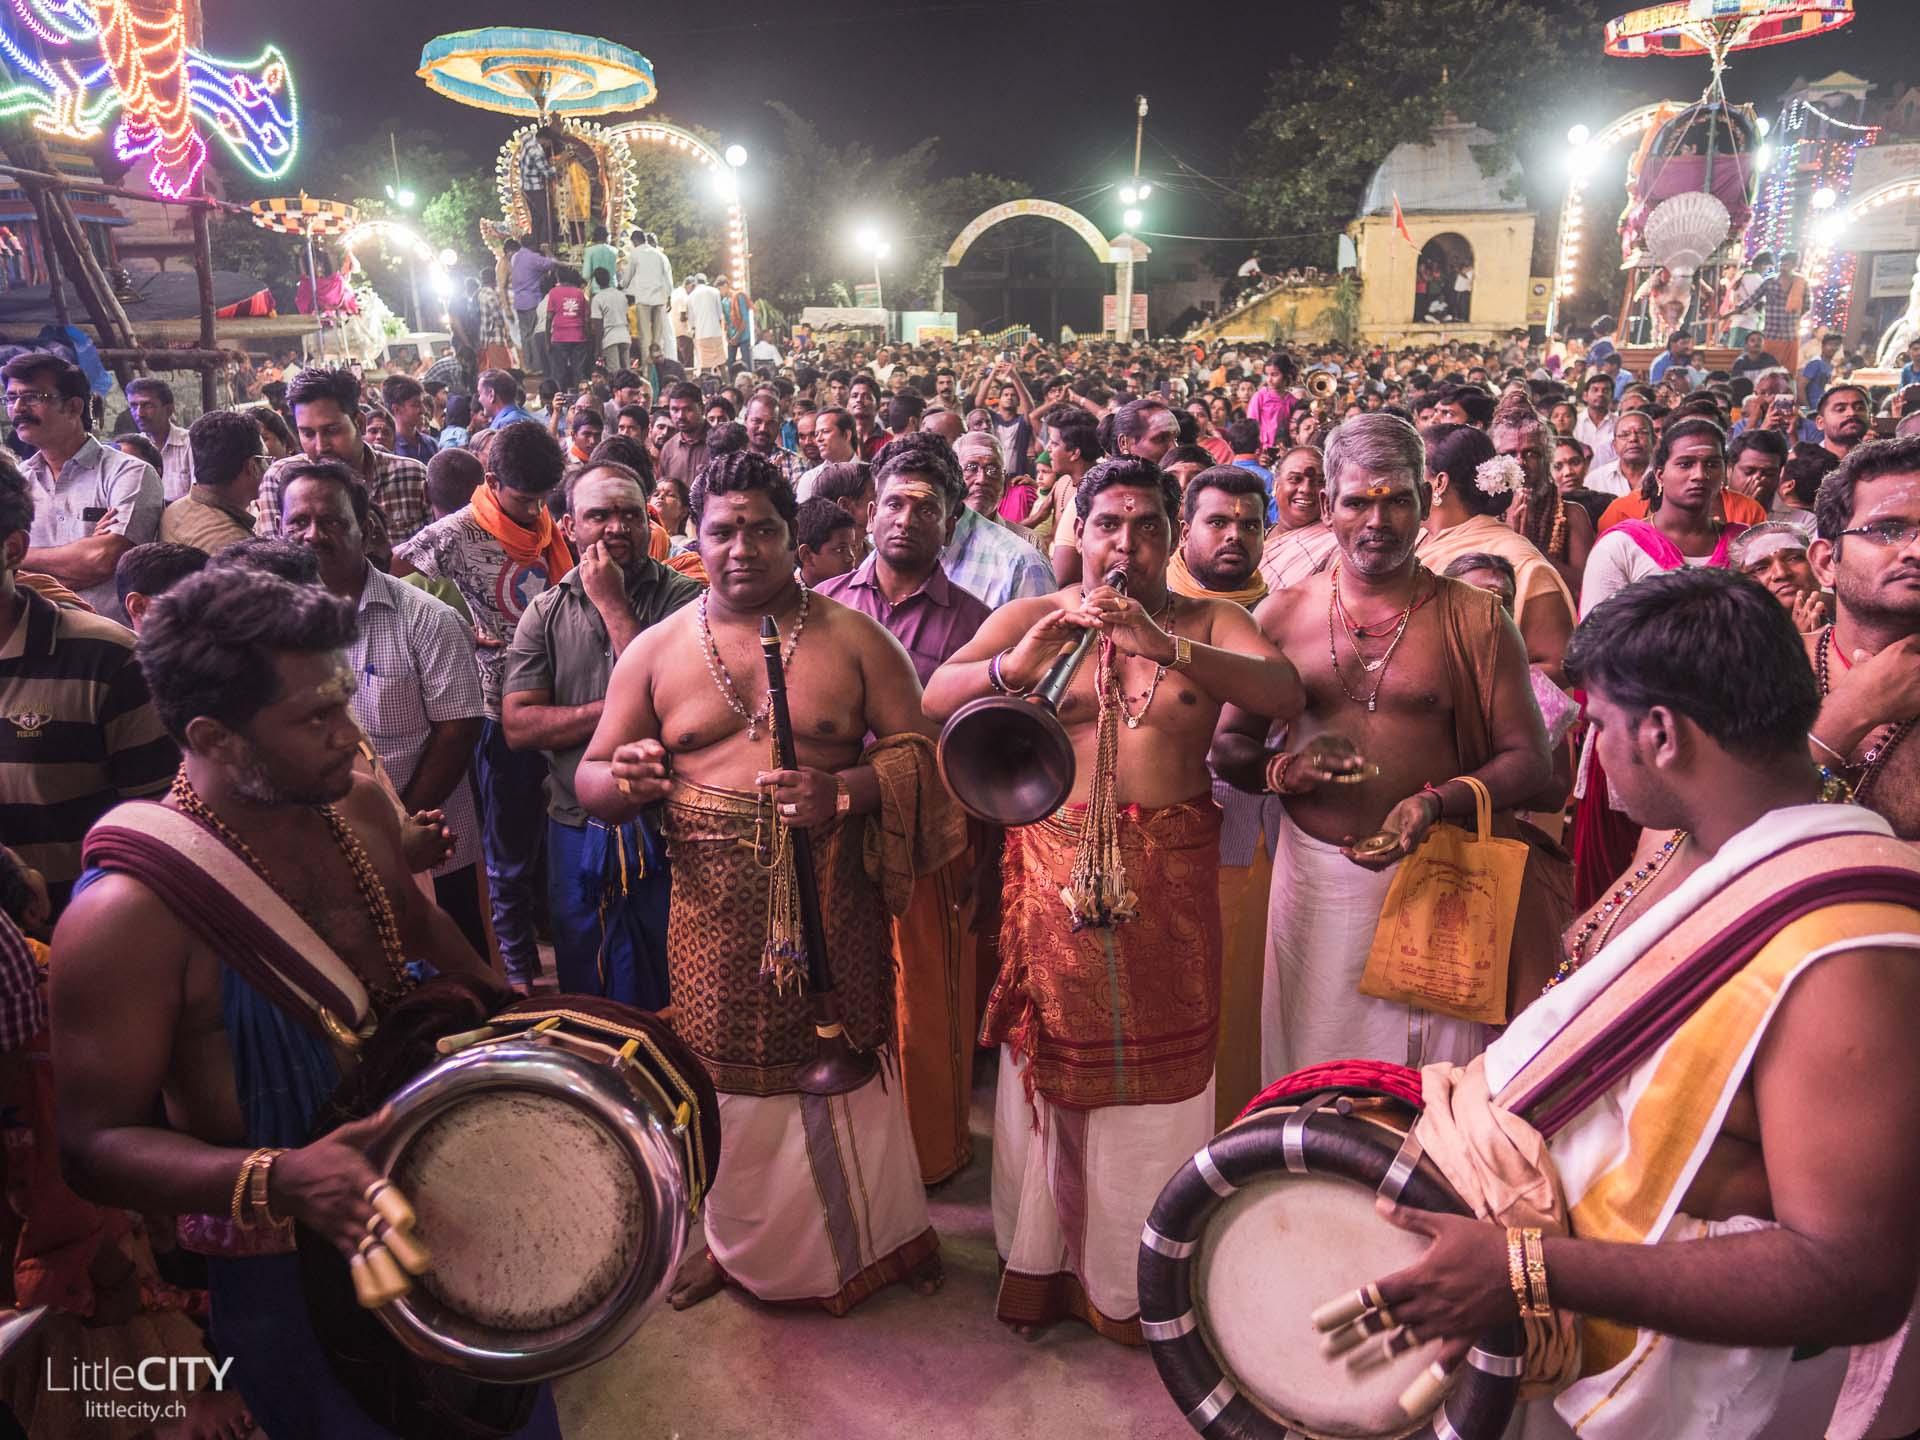 Tiruvannamalai Karthigai Deepam Festival Indien